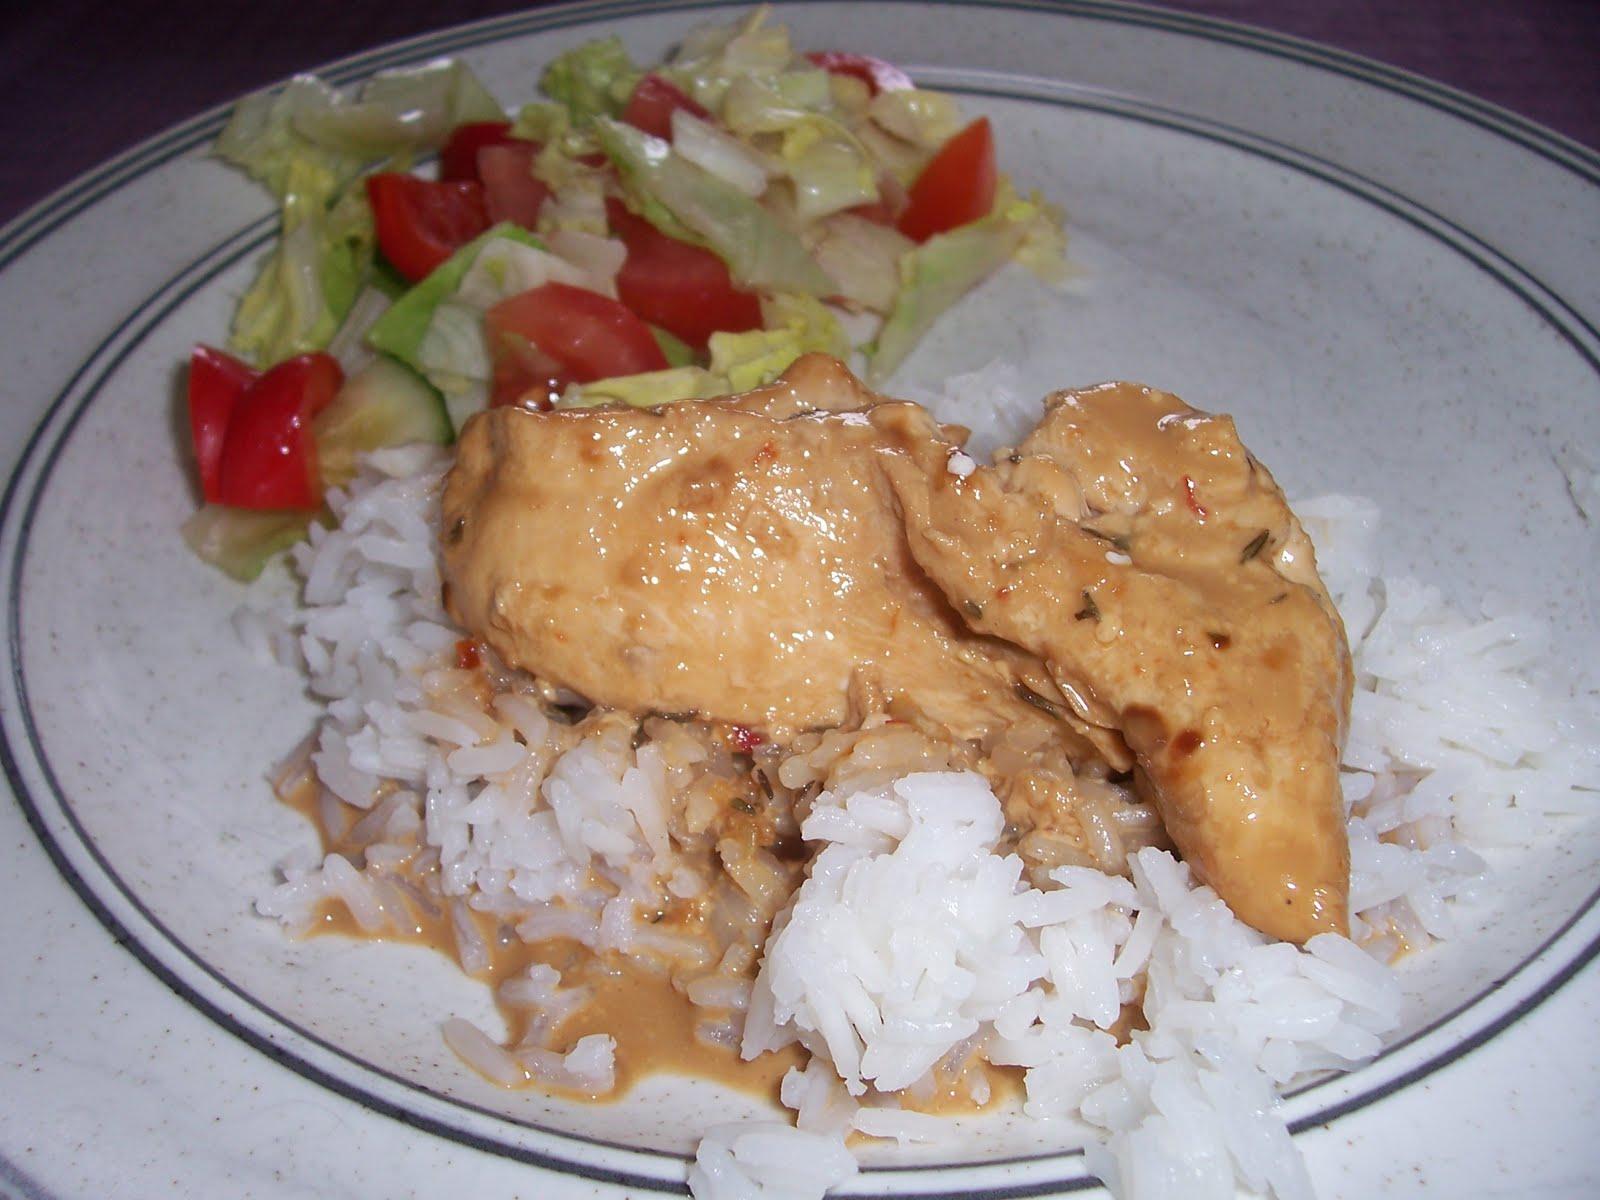 recept kycklingfilé creme fraiche